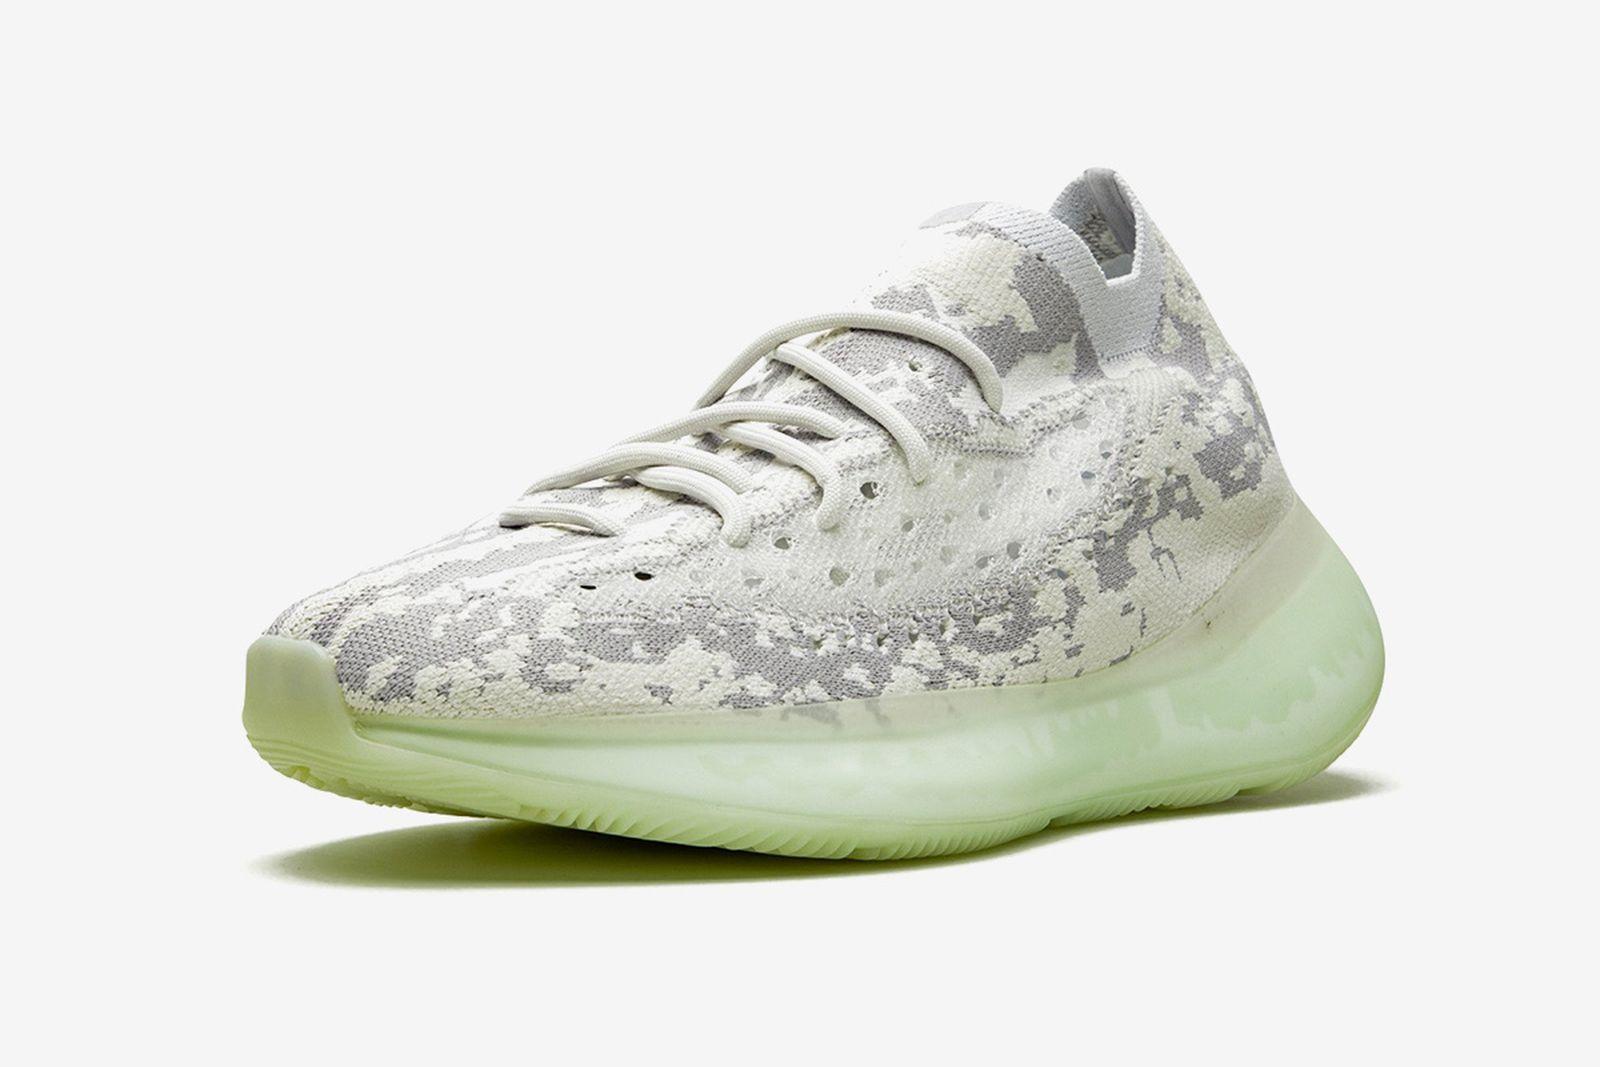 adidas-yeezy-alien-03